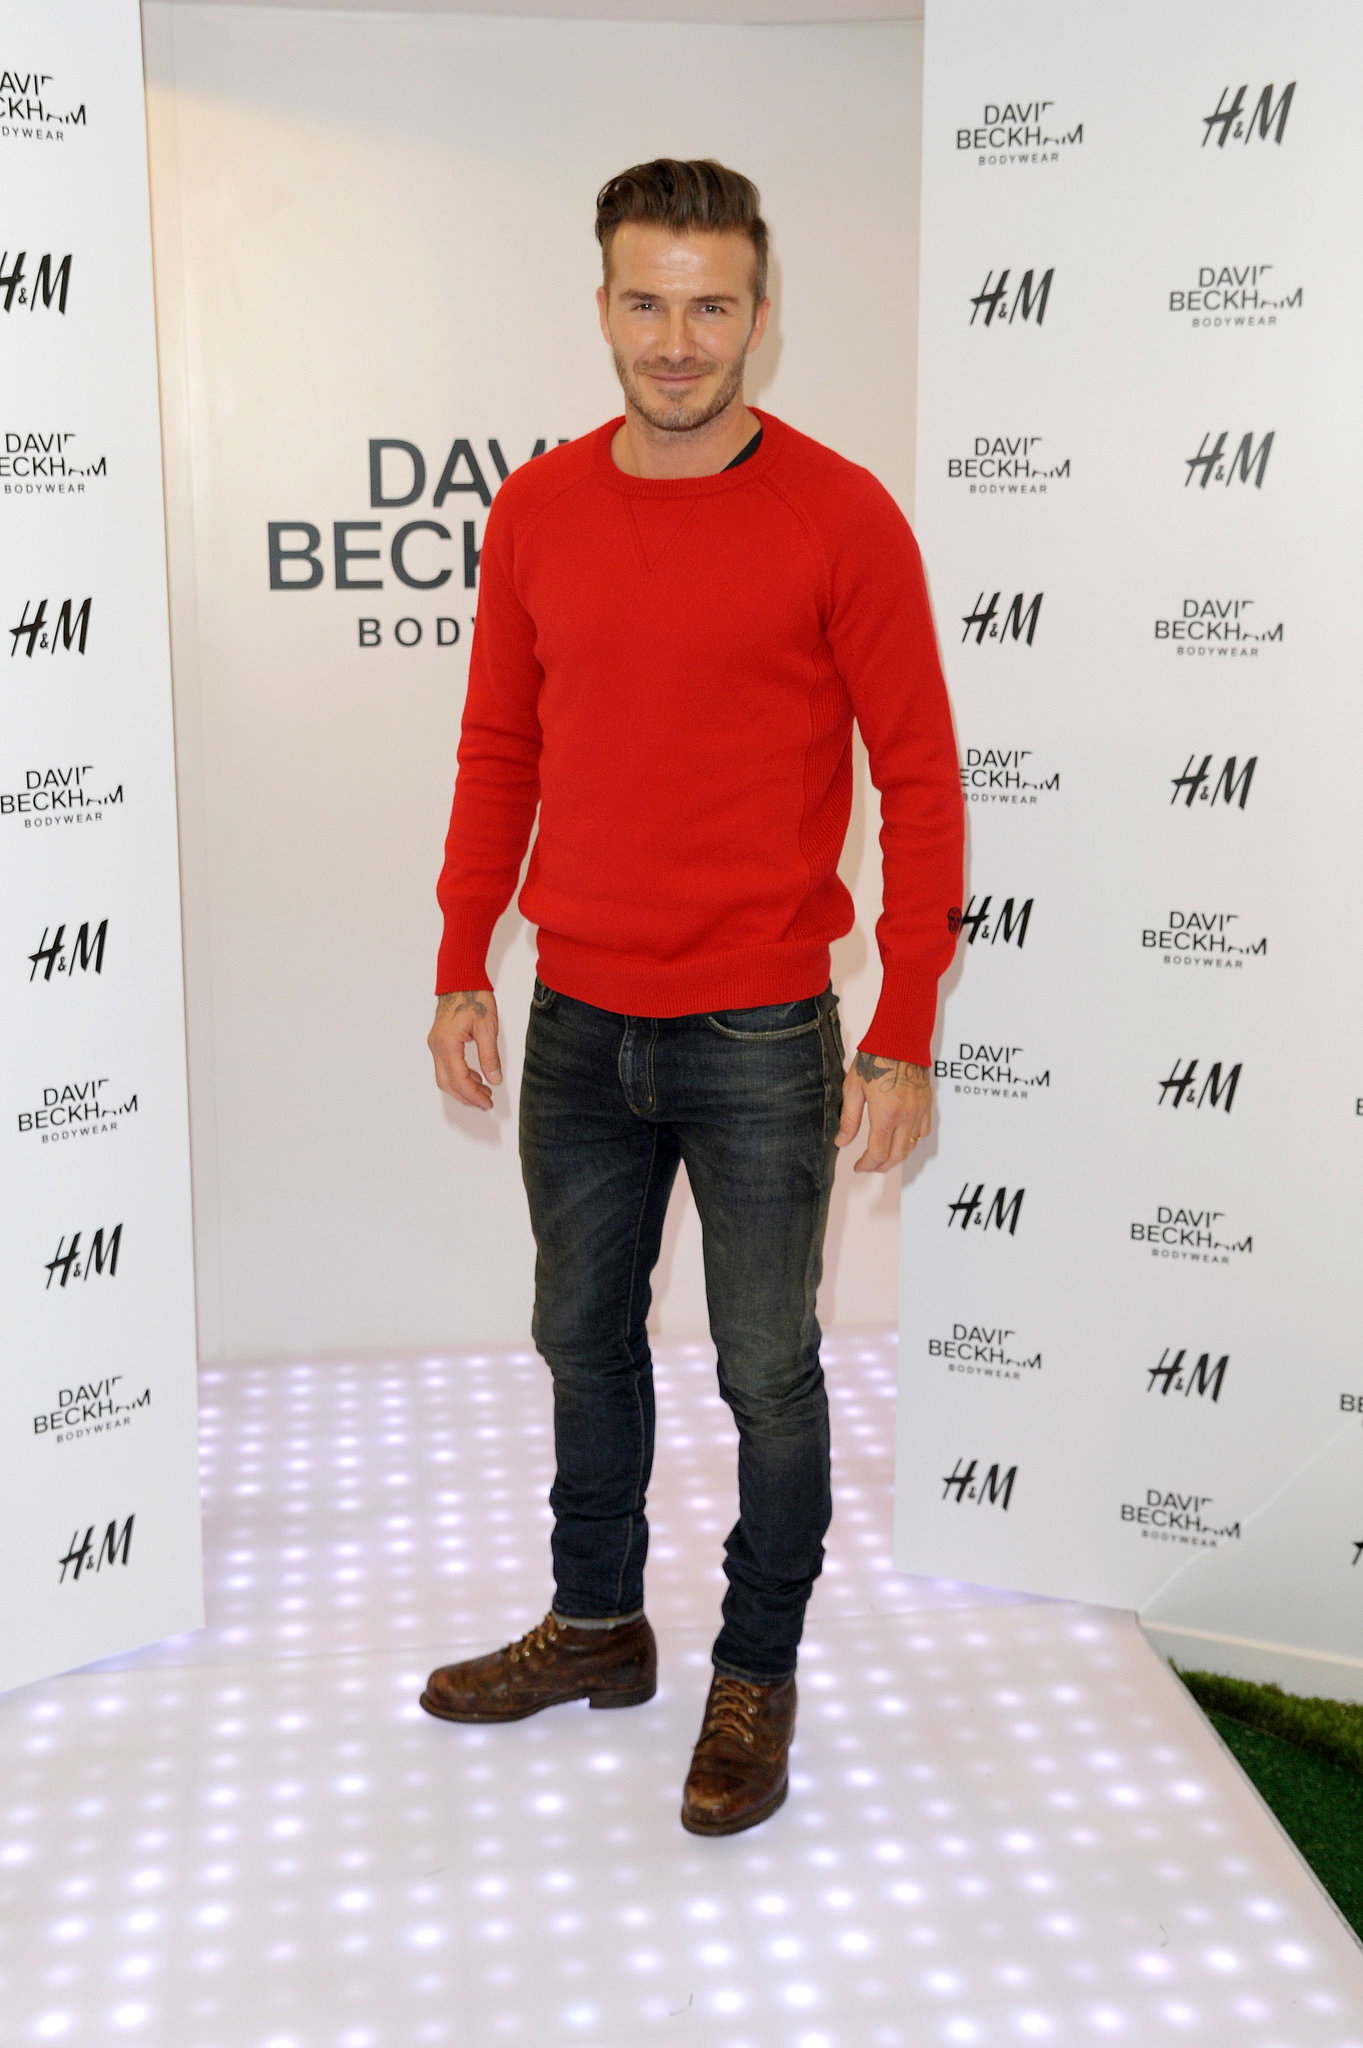 David Beckham at his H&M bodywear launch.